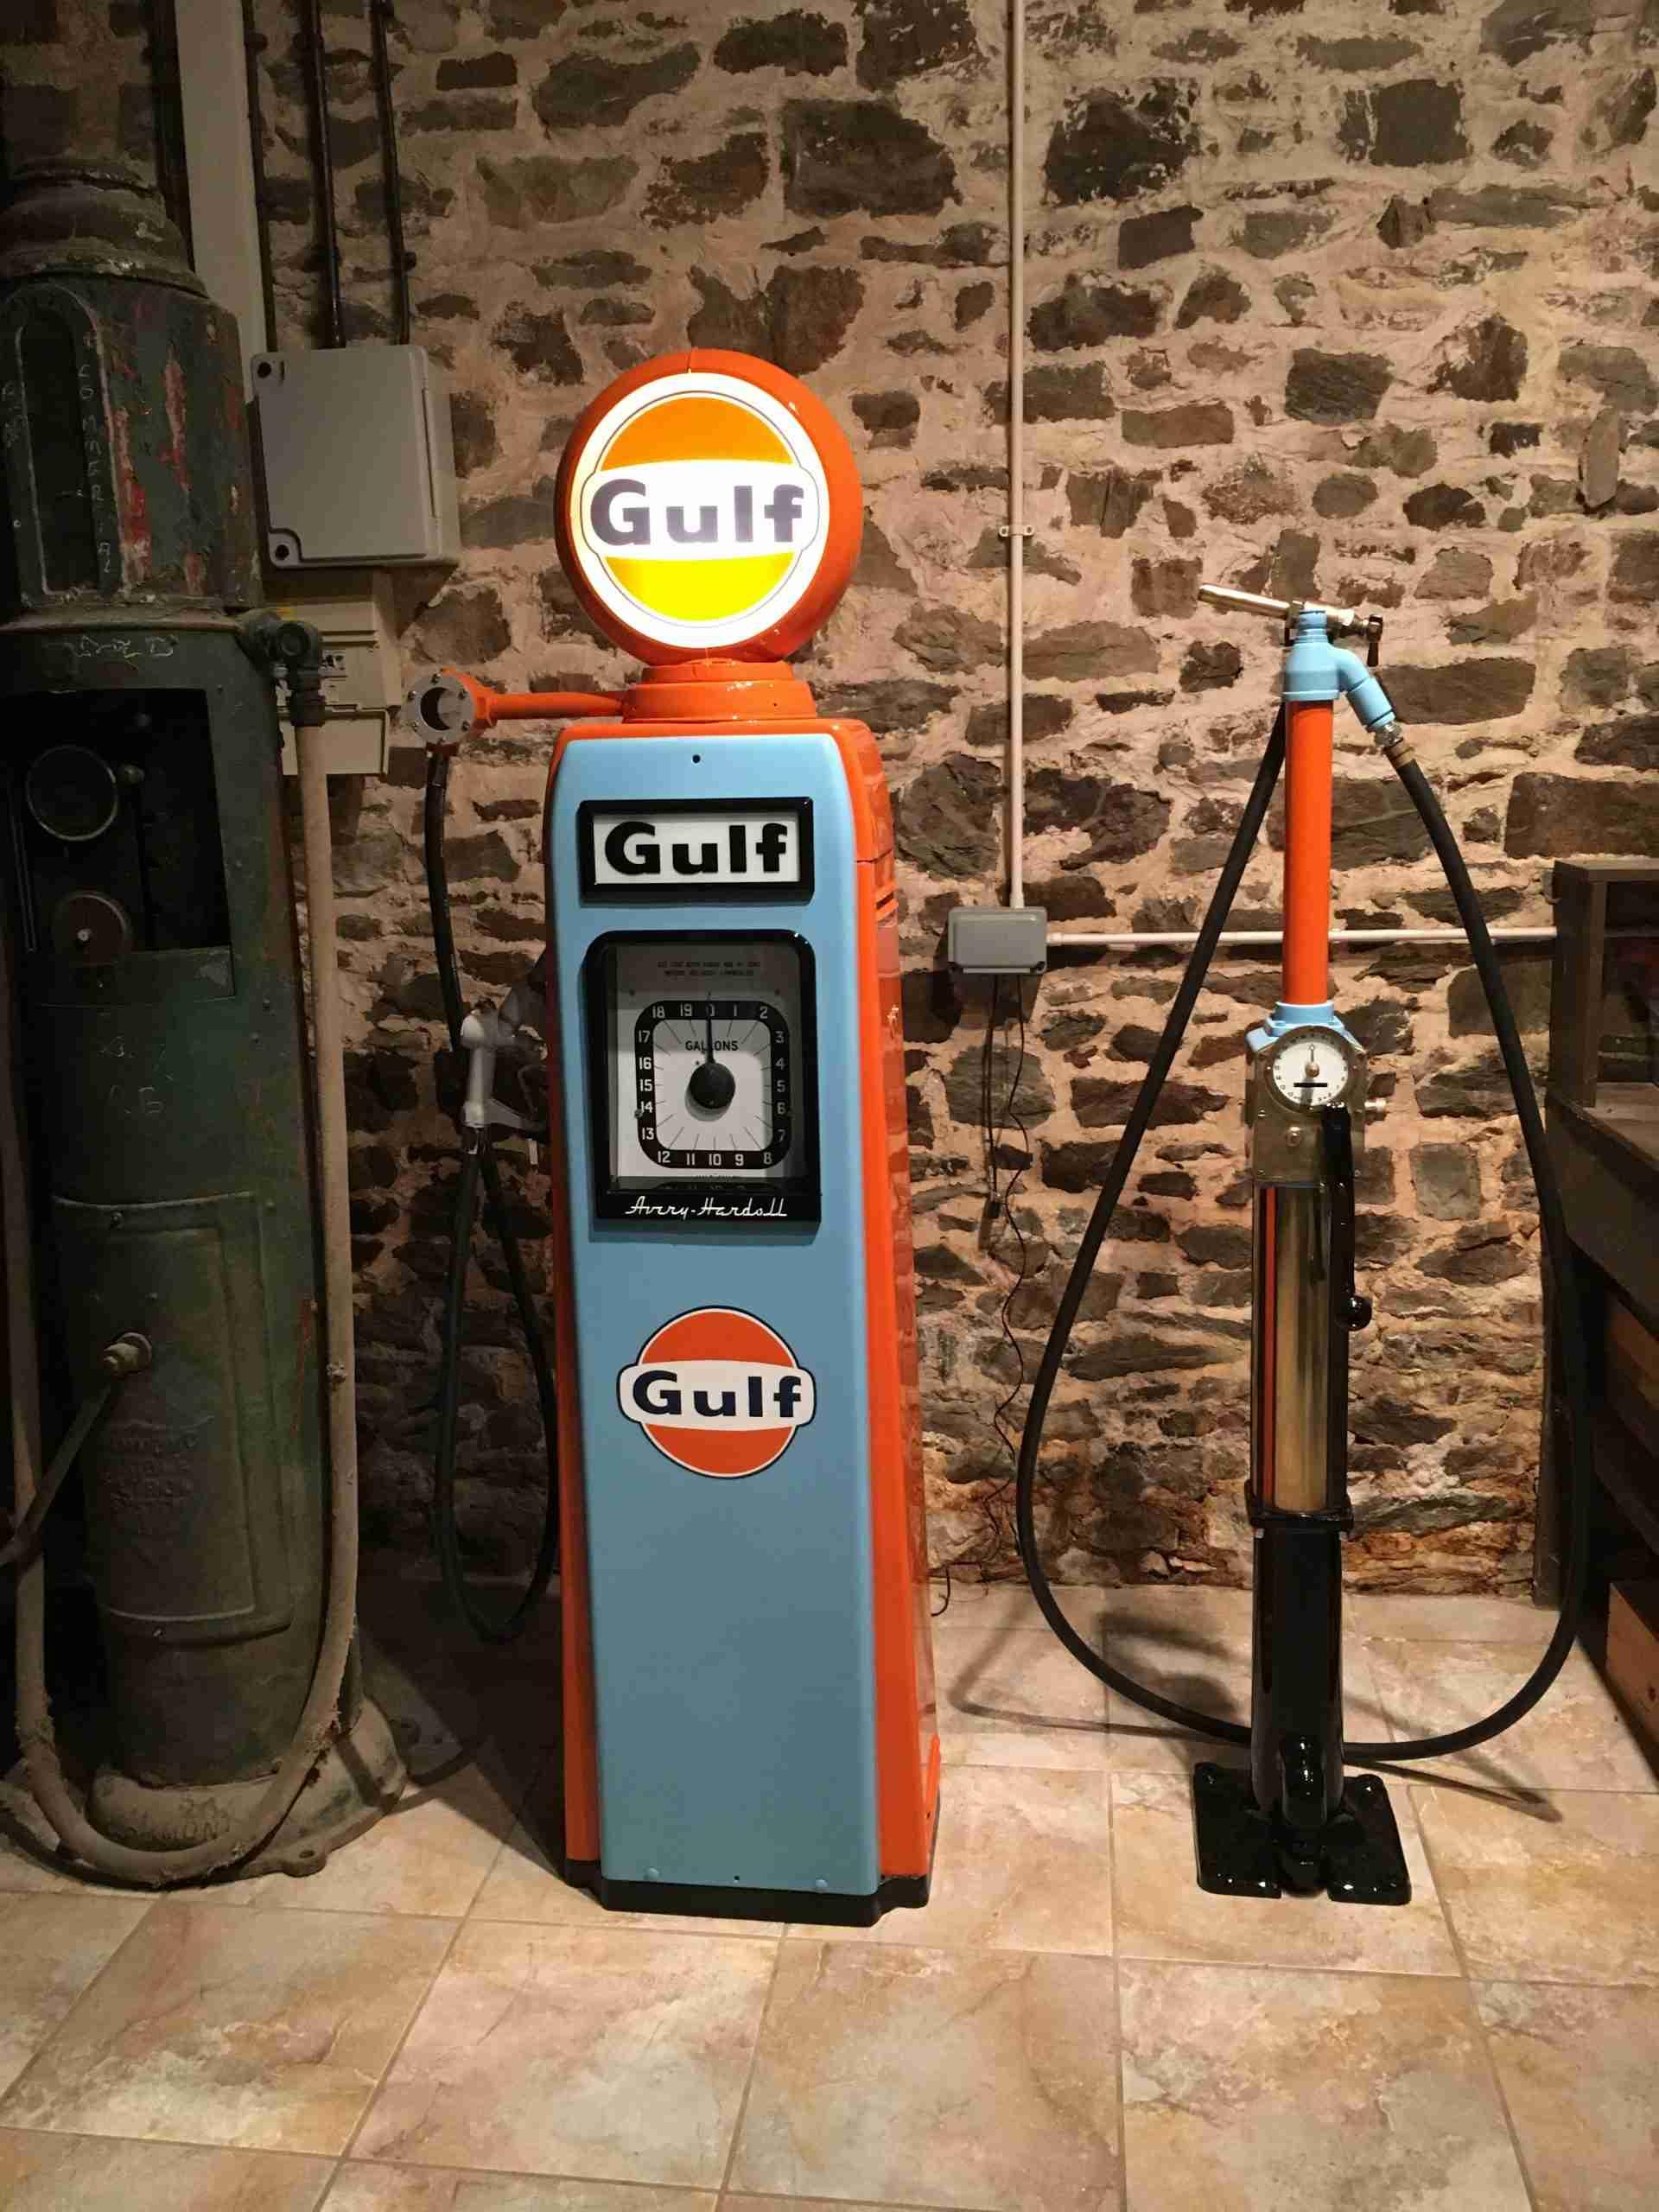 UK Restoration's Restored Avery Hardoll Petrol Pump in Gulf Livery